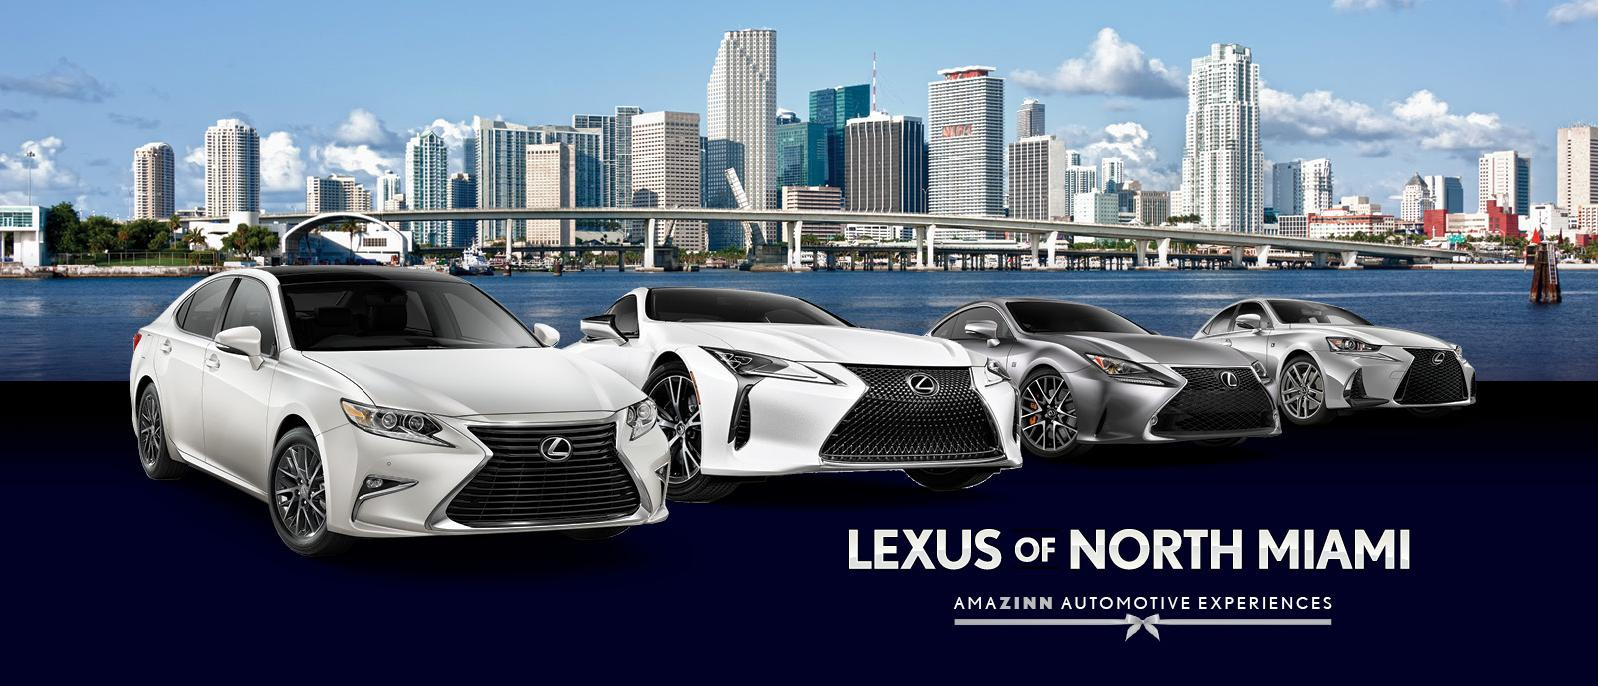 Lexus Lease Offers >> Lexus Lease Specials Lexus Of North Miami Near Ft